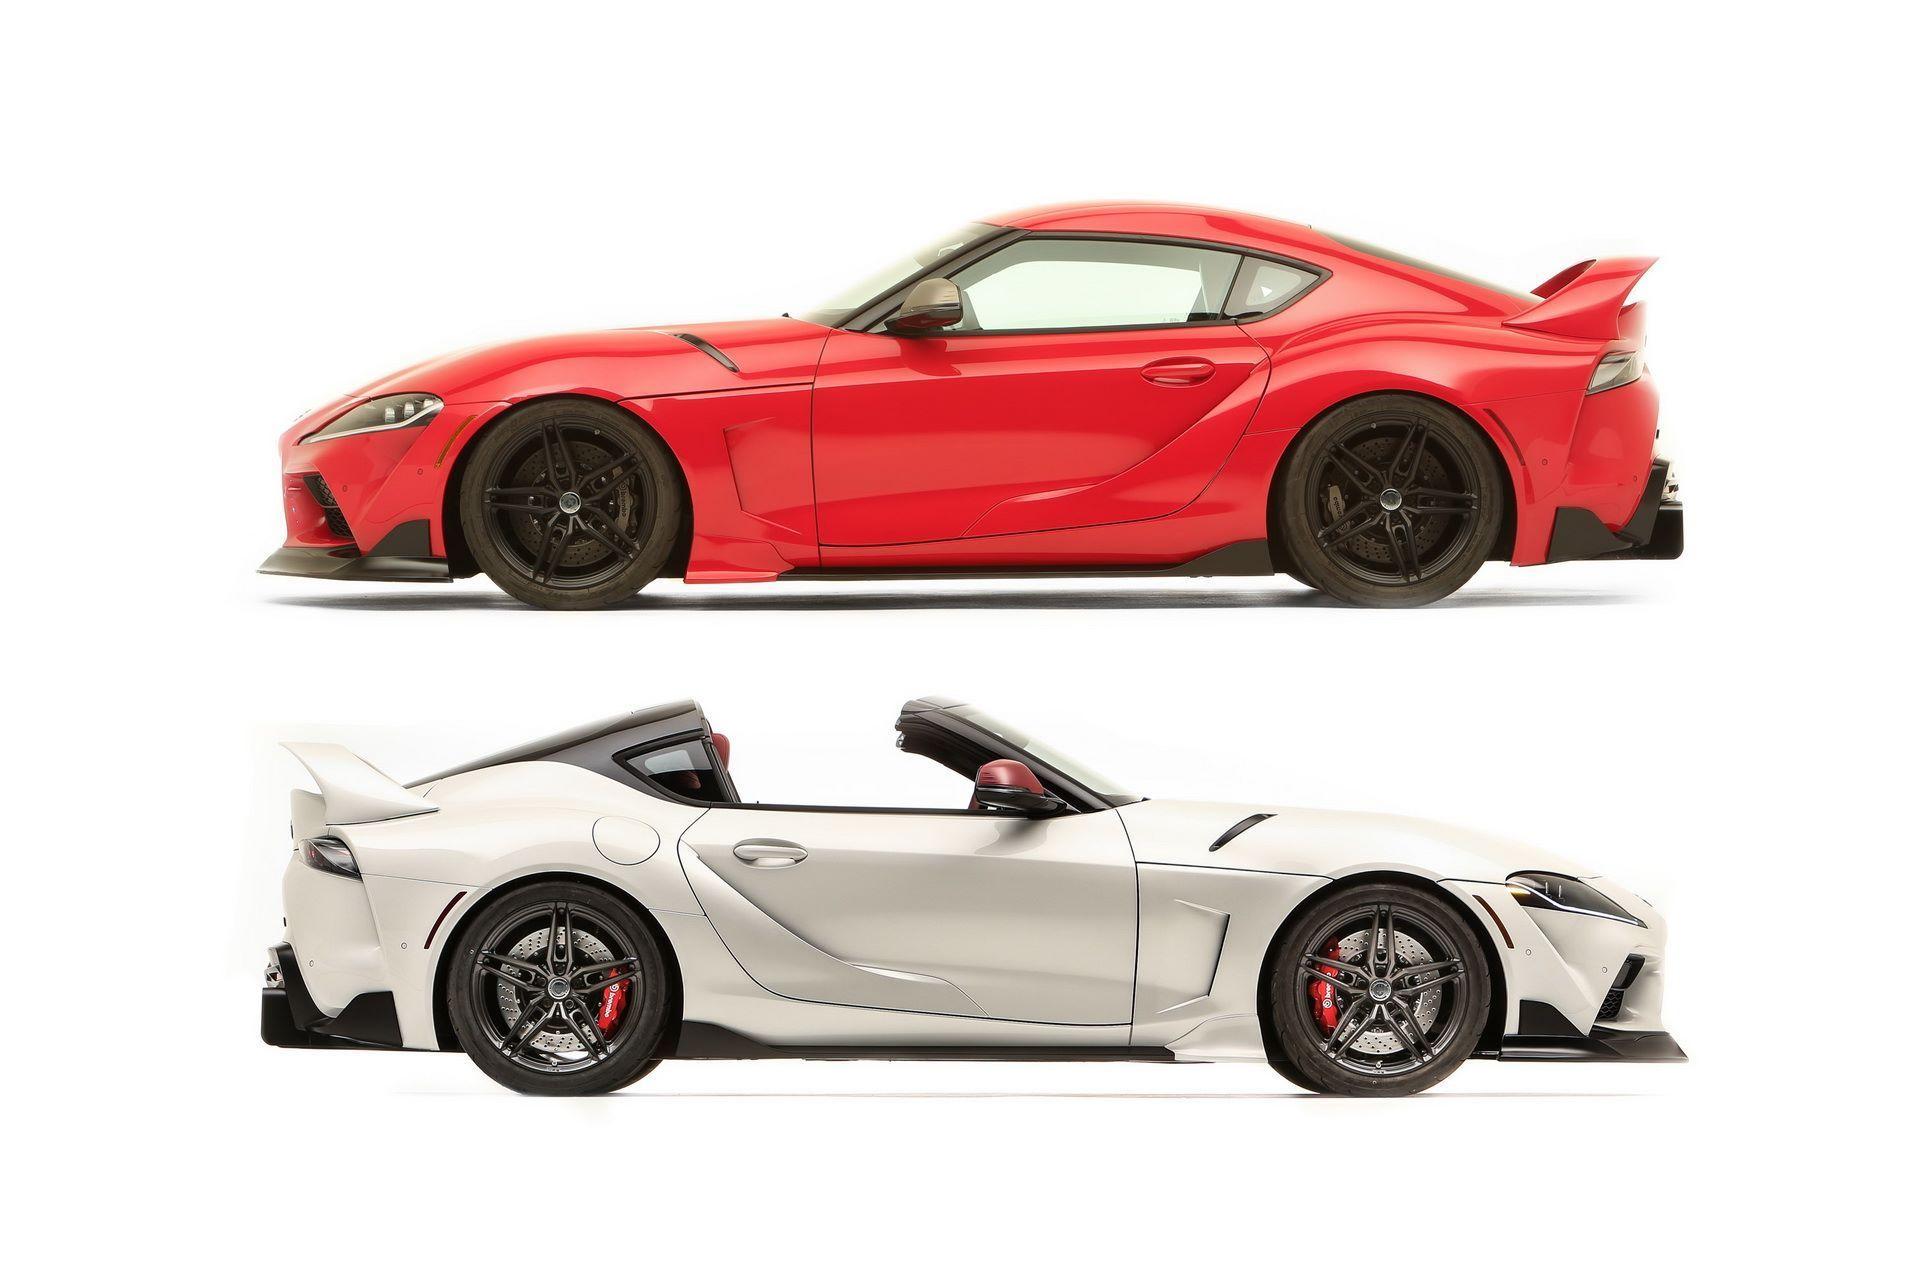 toyota-sema-2020-new-cars-5